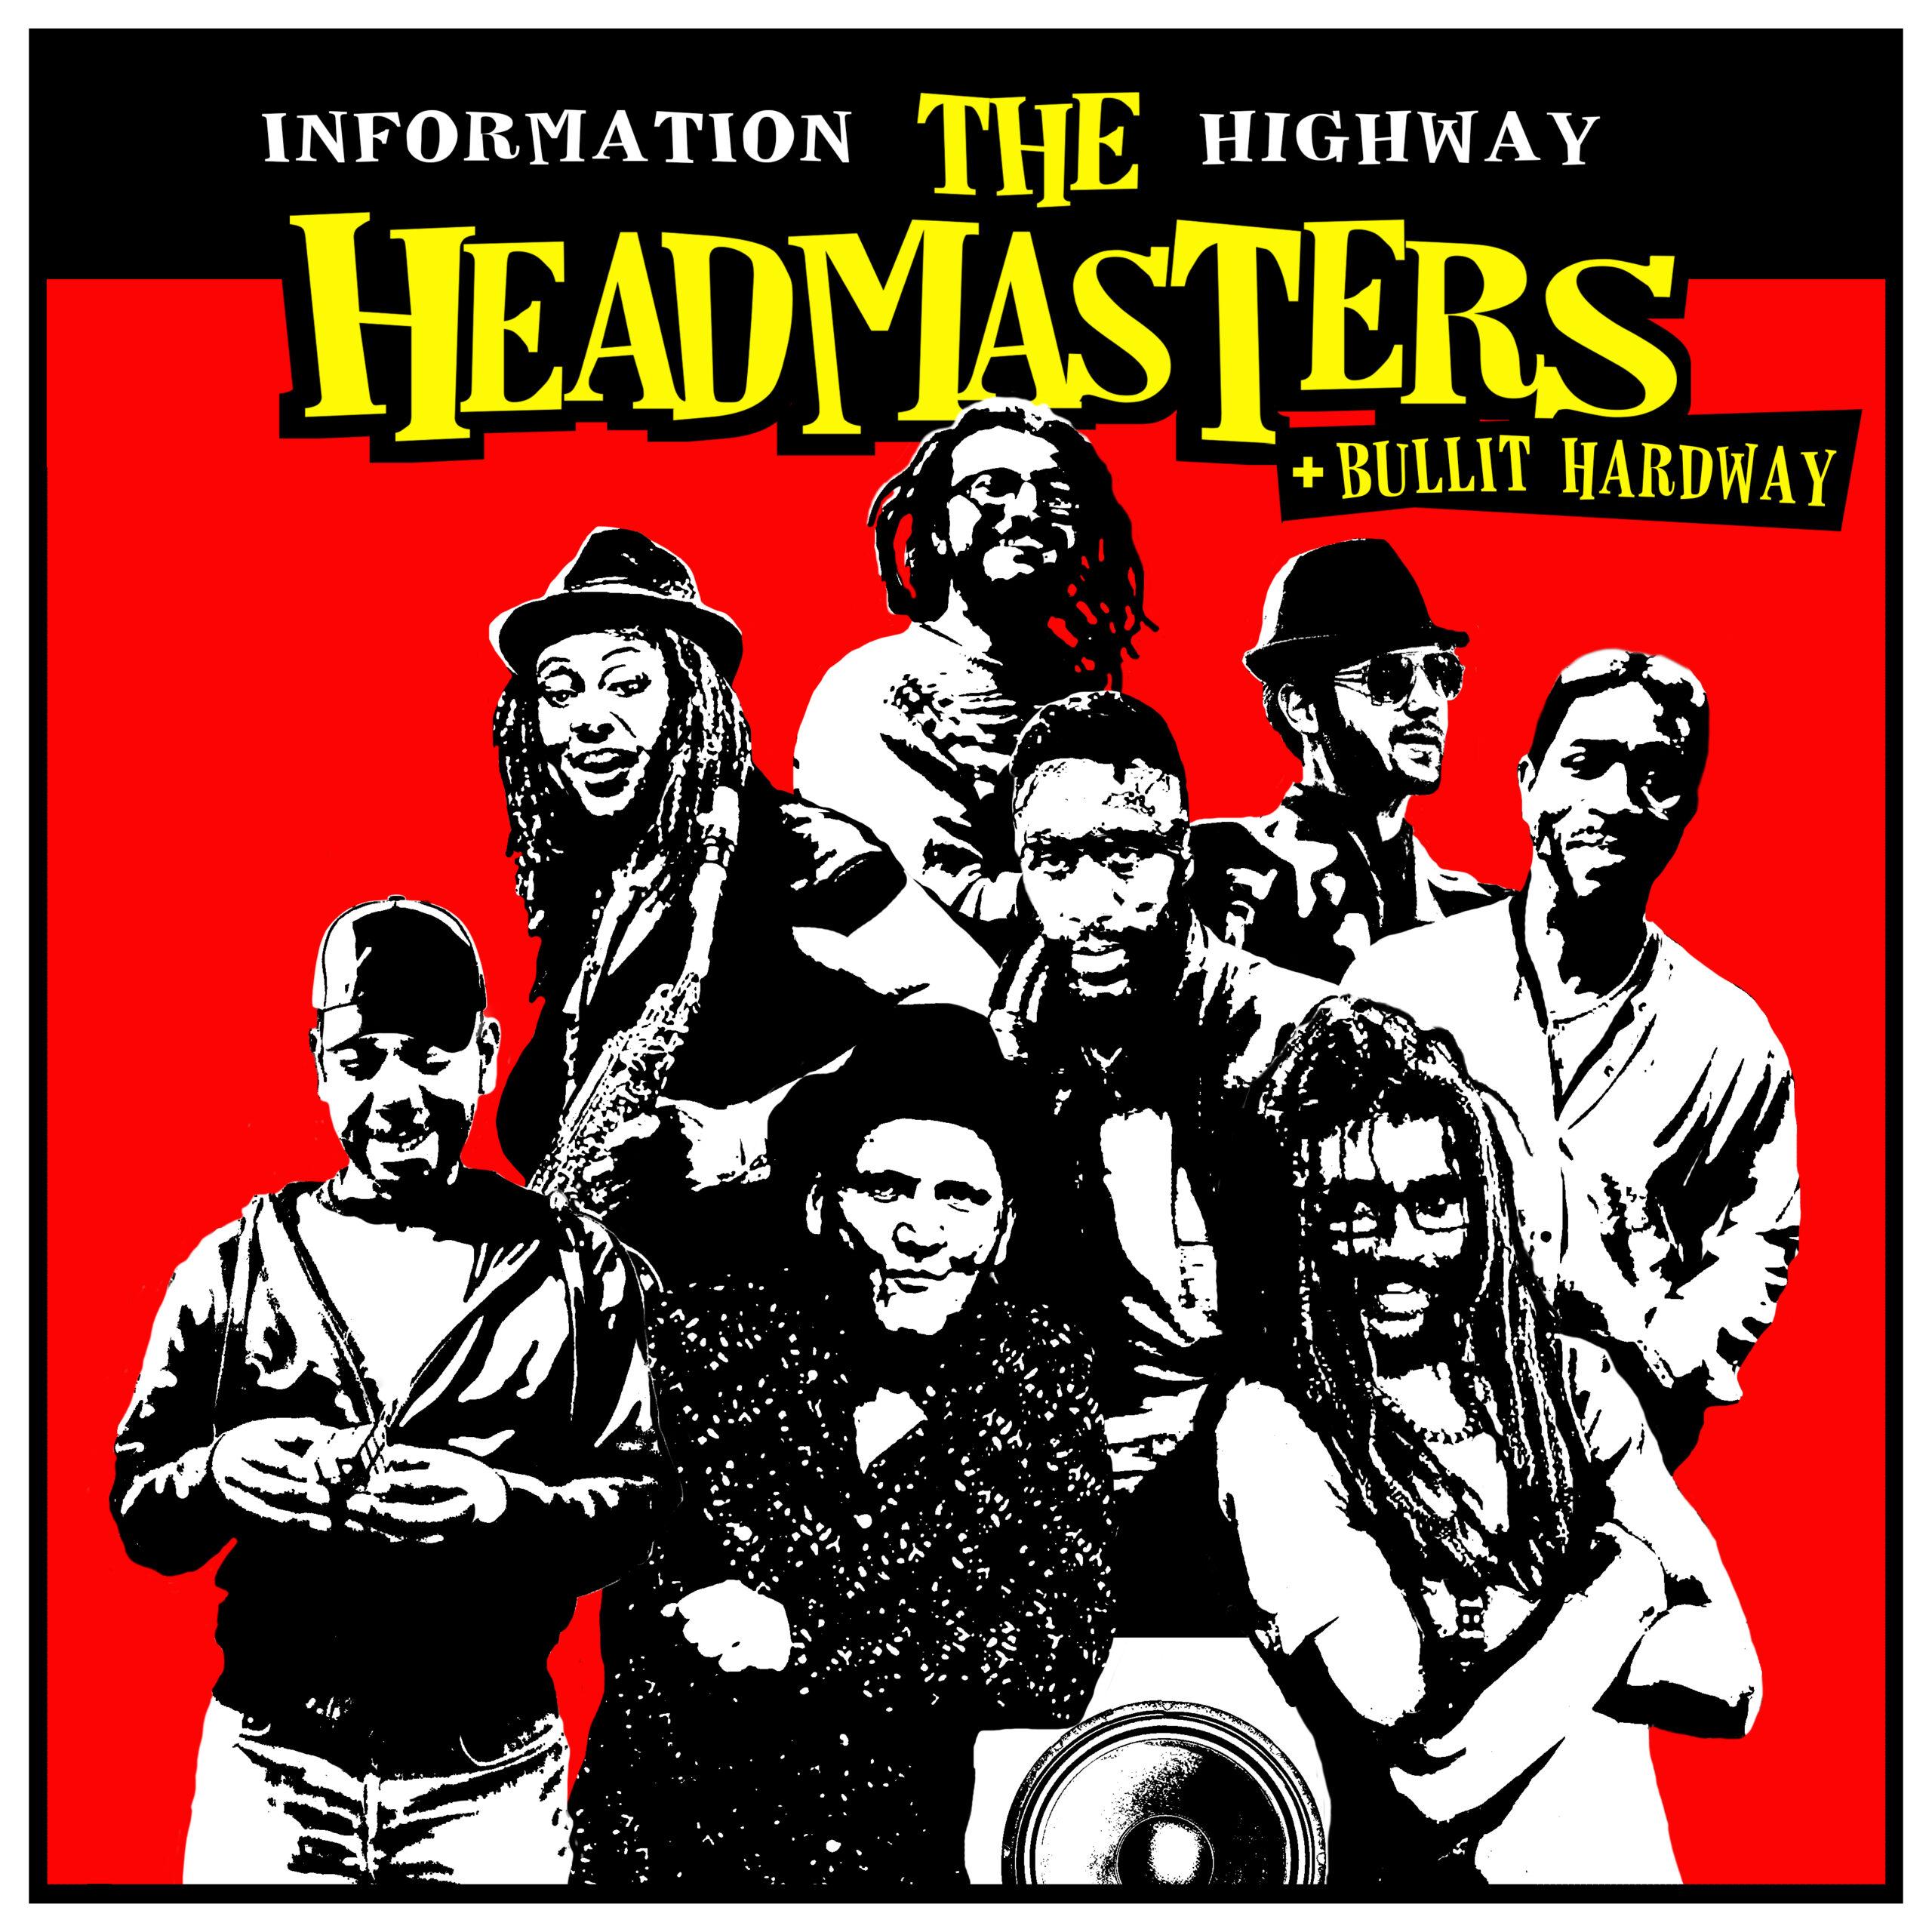 The-Headmasters_Information-Highway_Slipway-Records